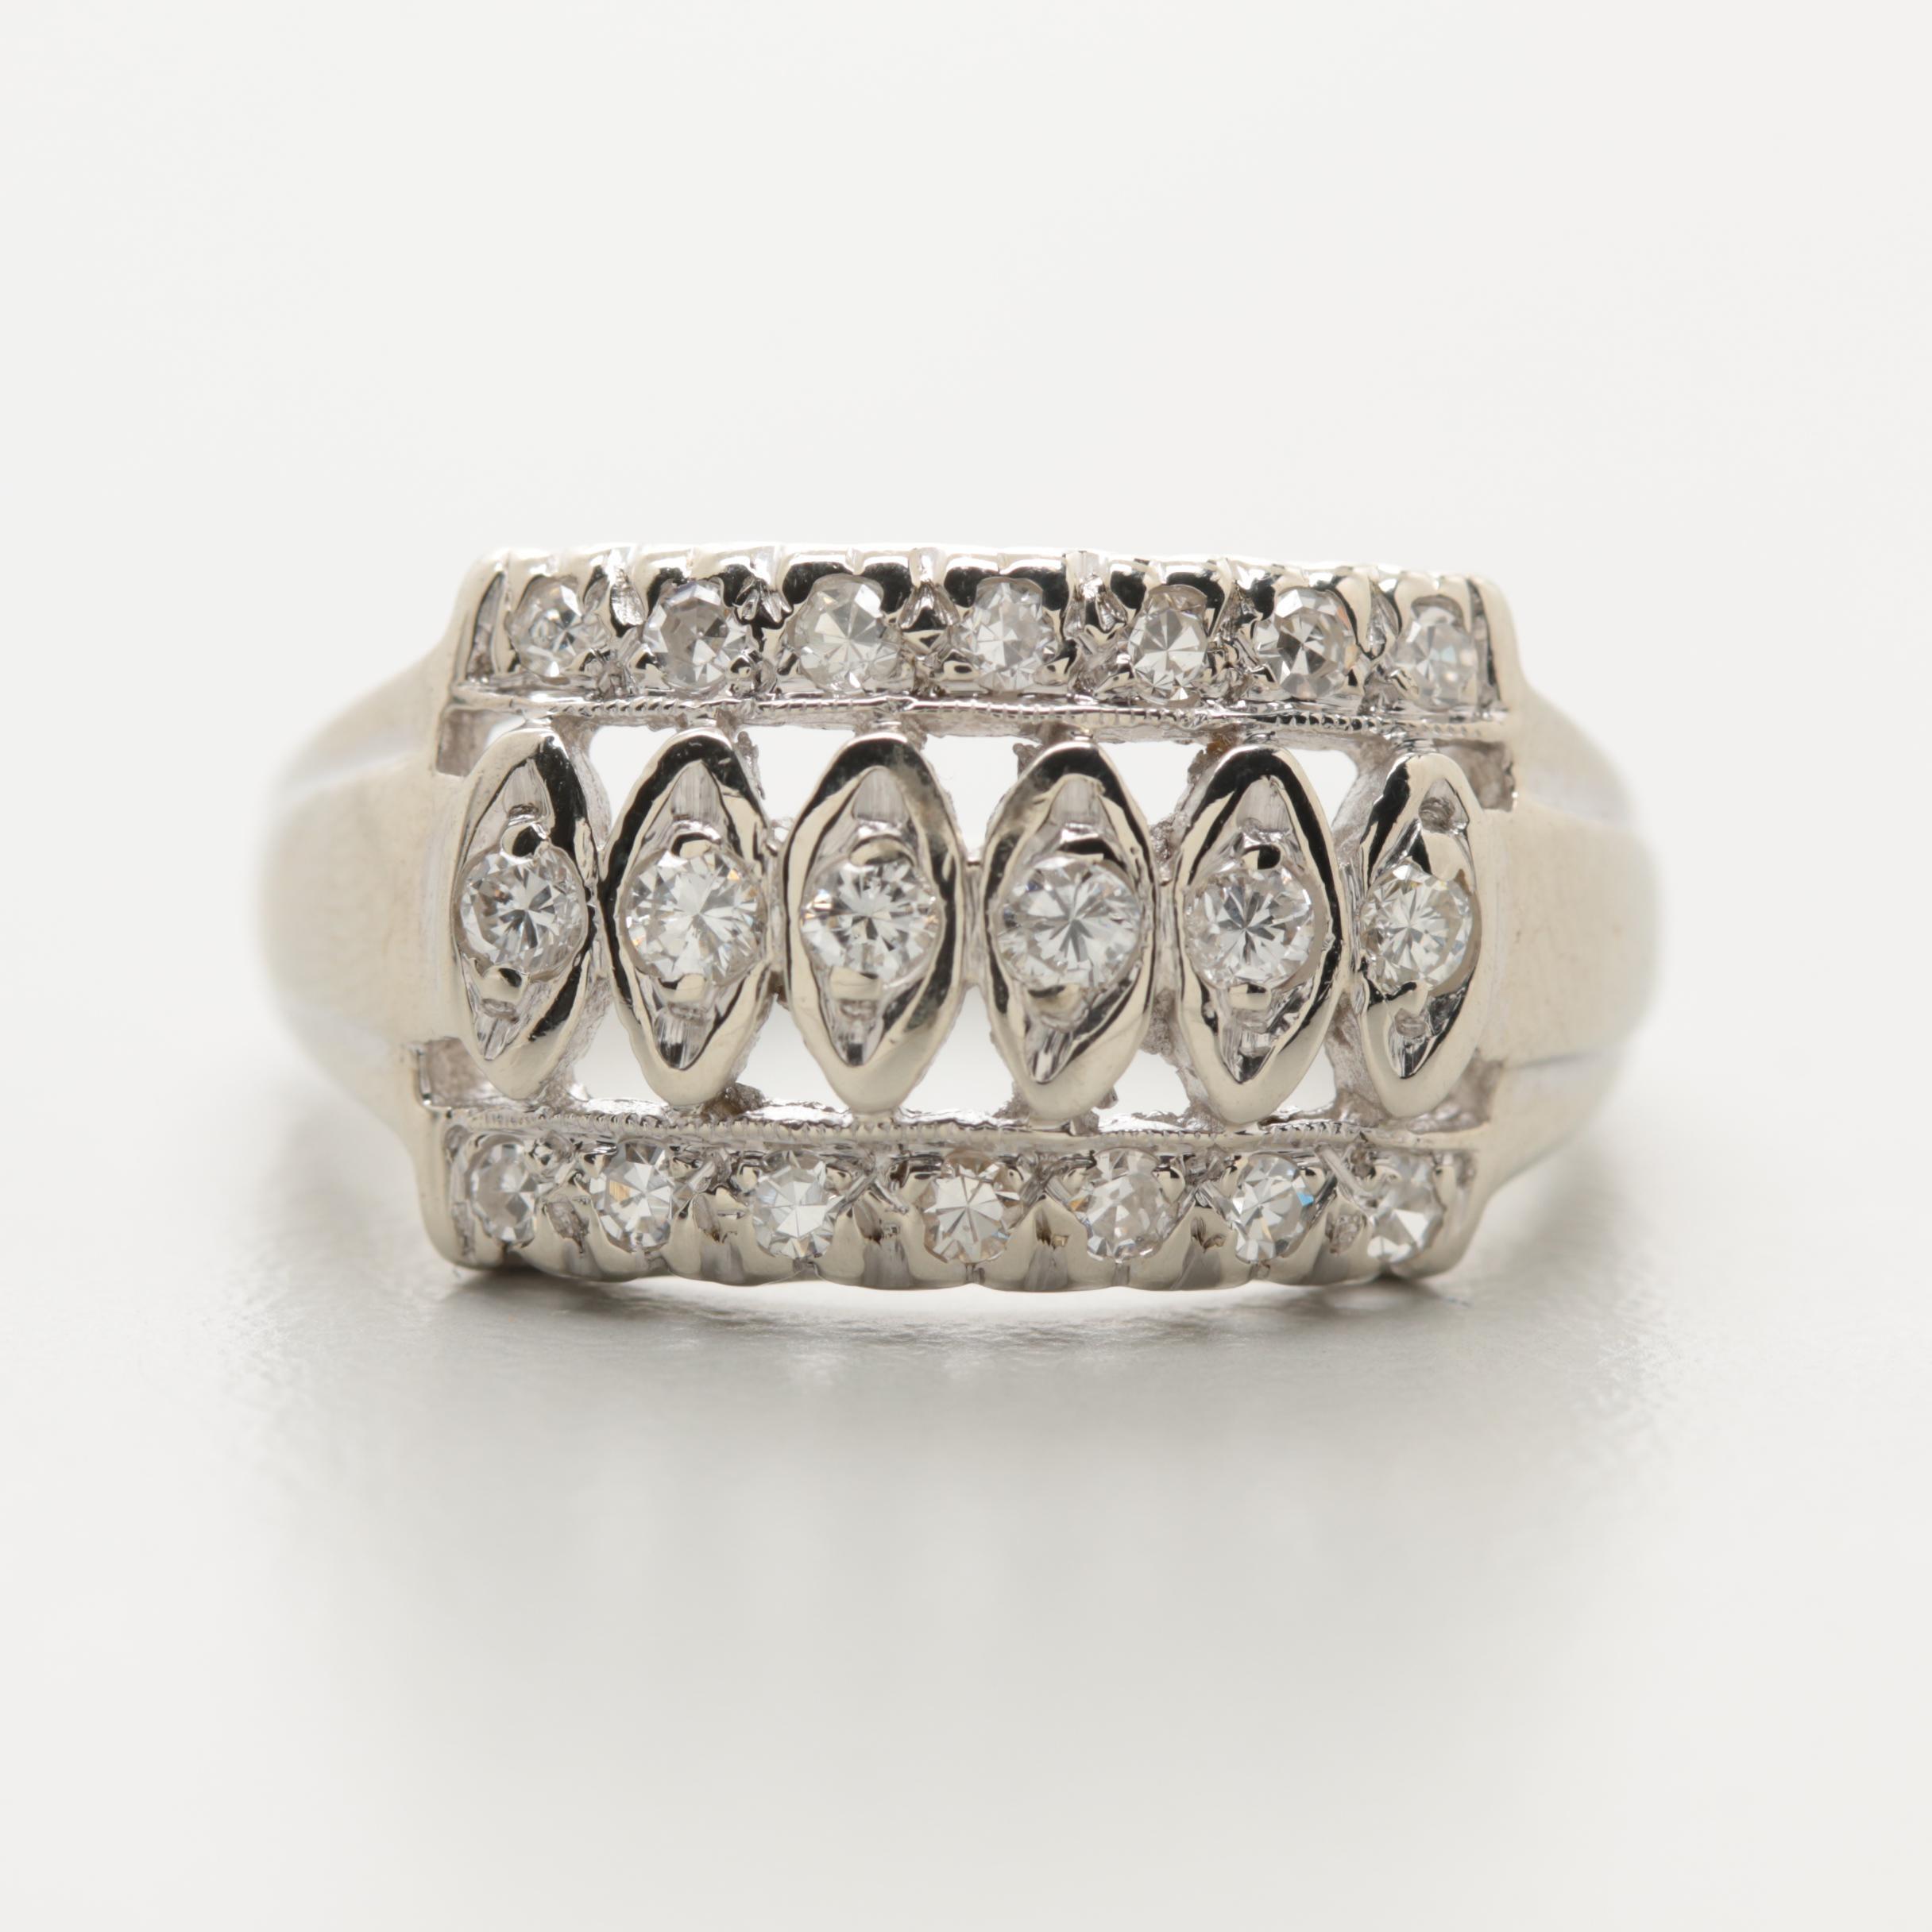 14K White Gold 0.33 CTW Diamond Ring